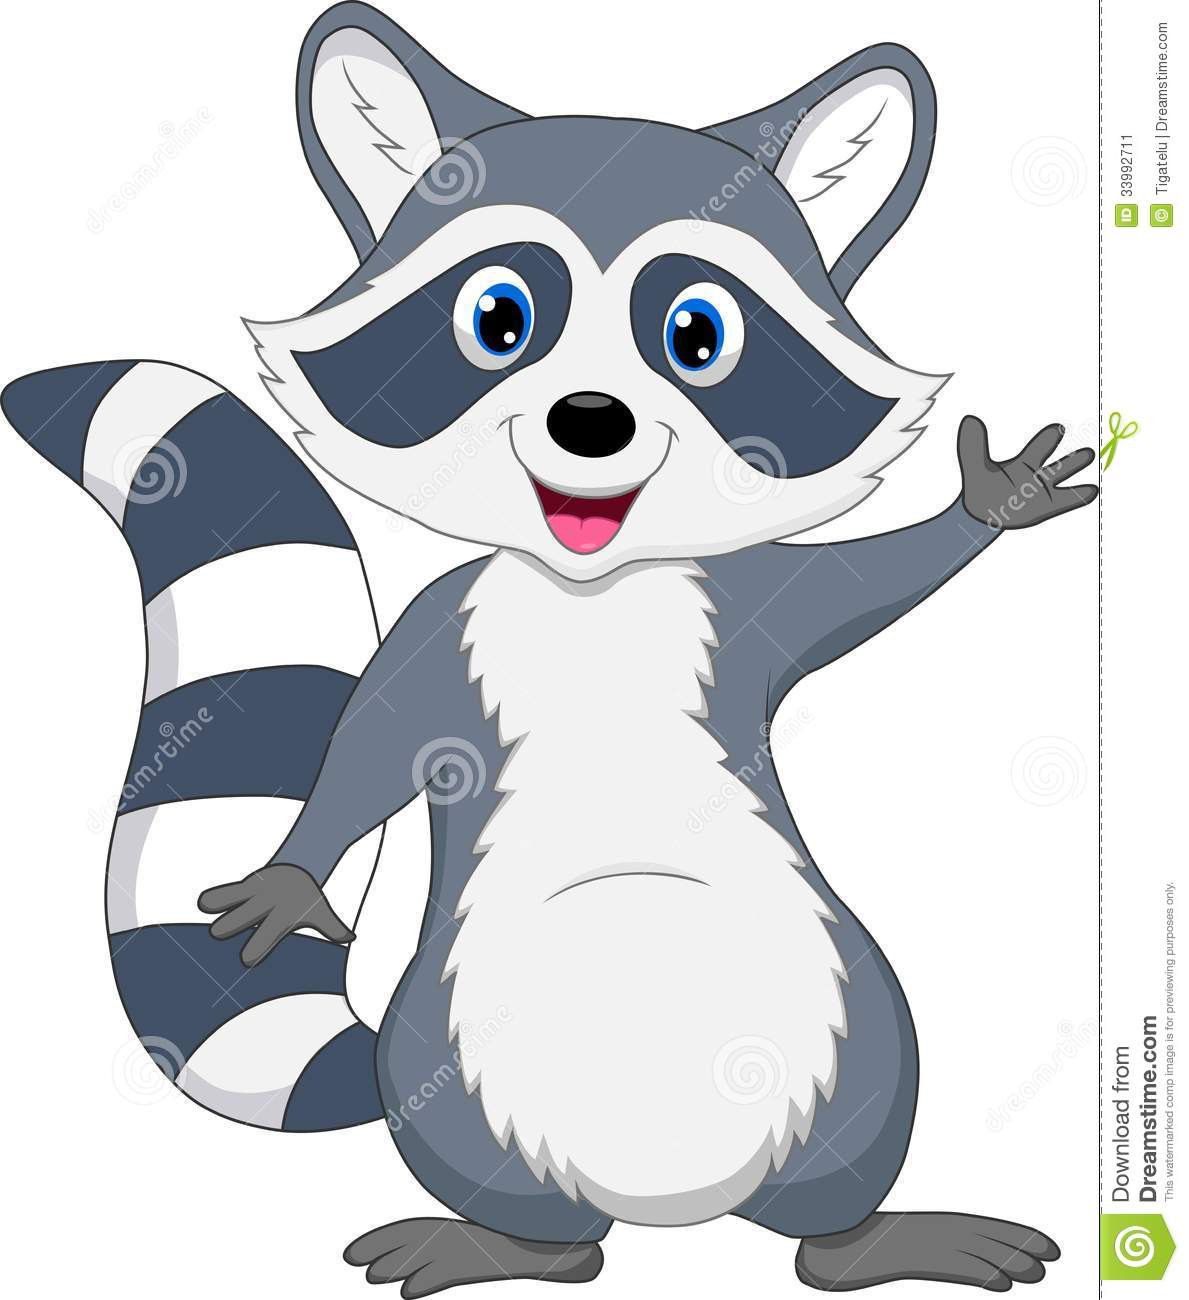 Raccoon Clip Art-Raccoon Clip Art-11